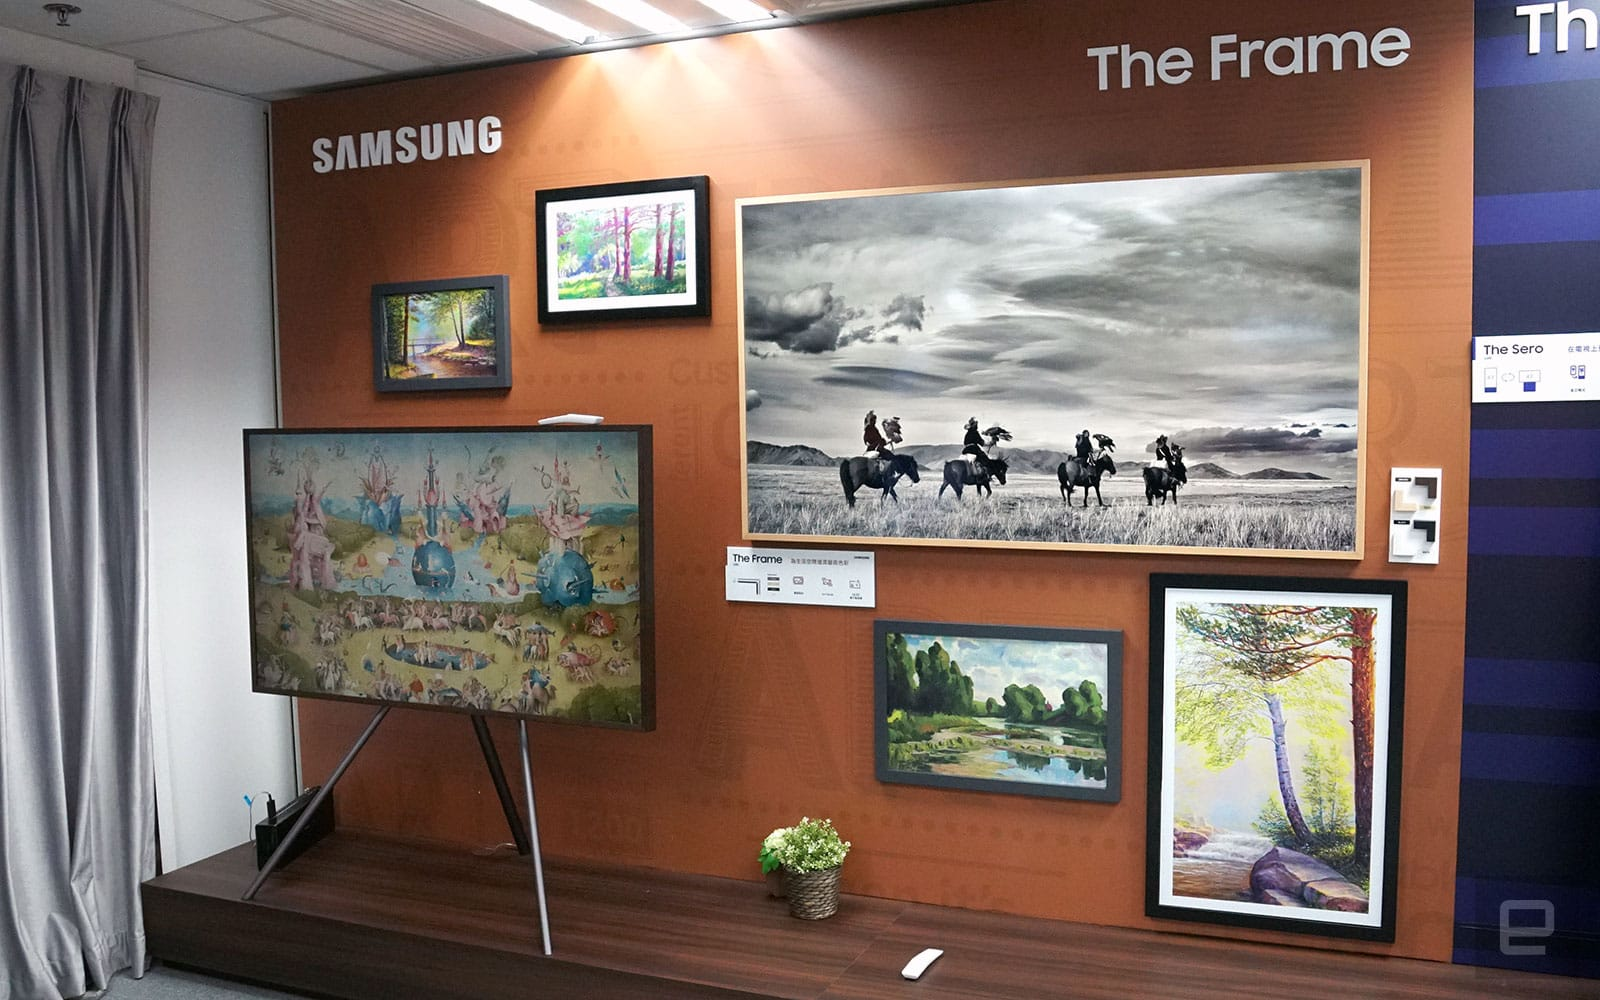 Samsung 2020 QLED TV